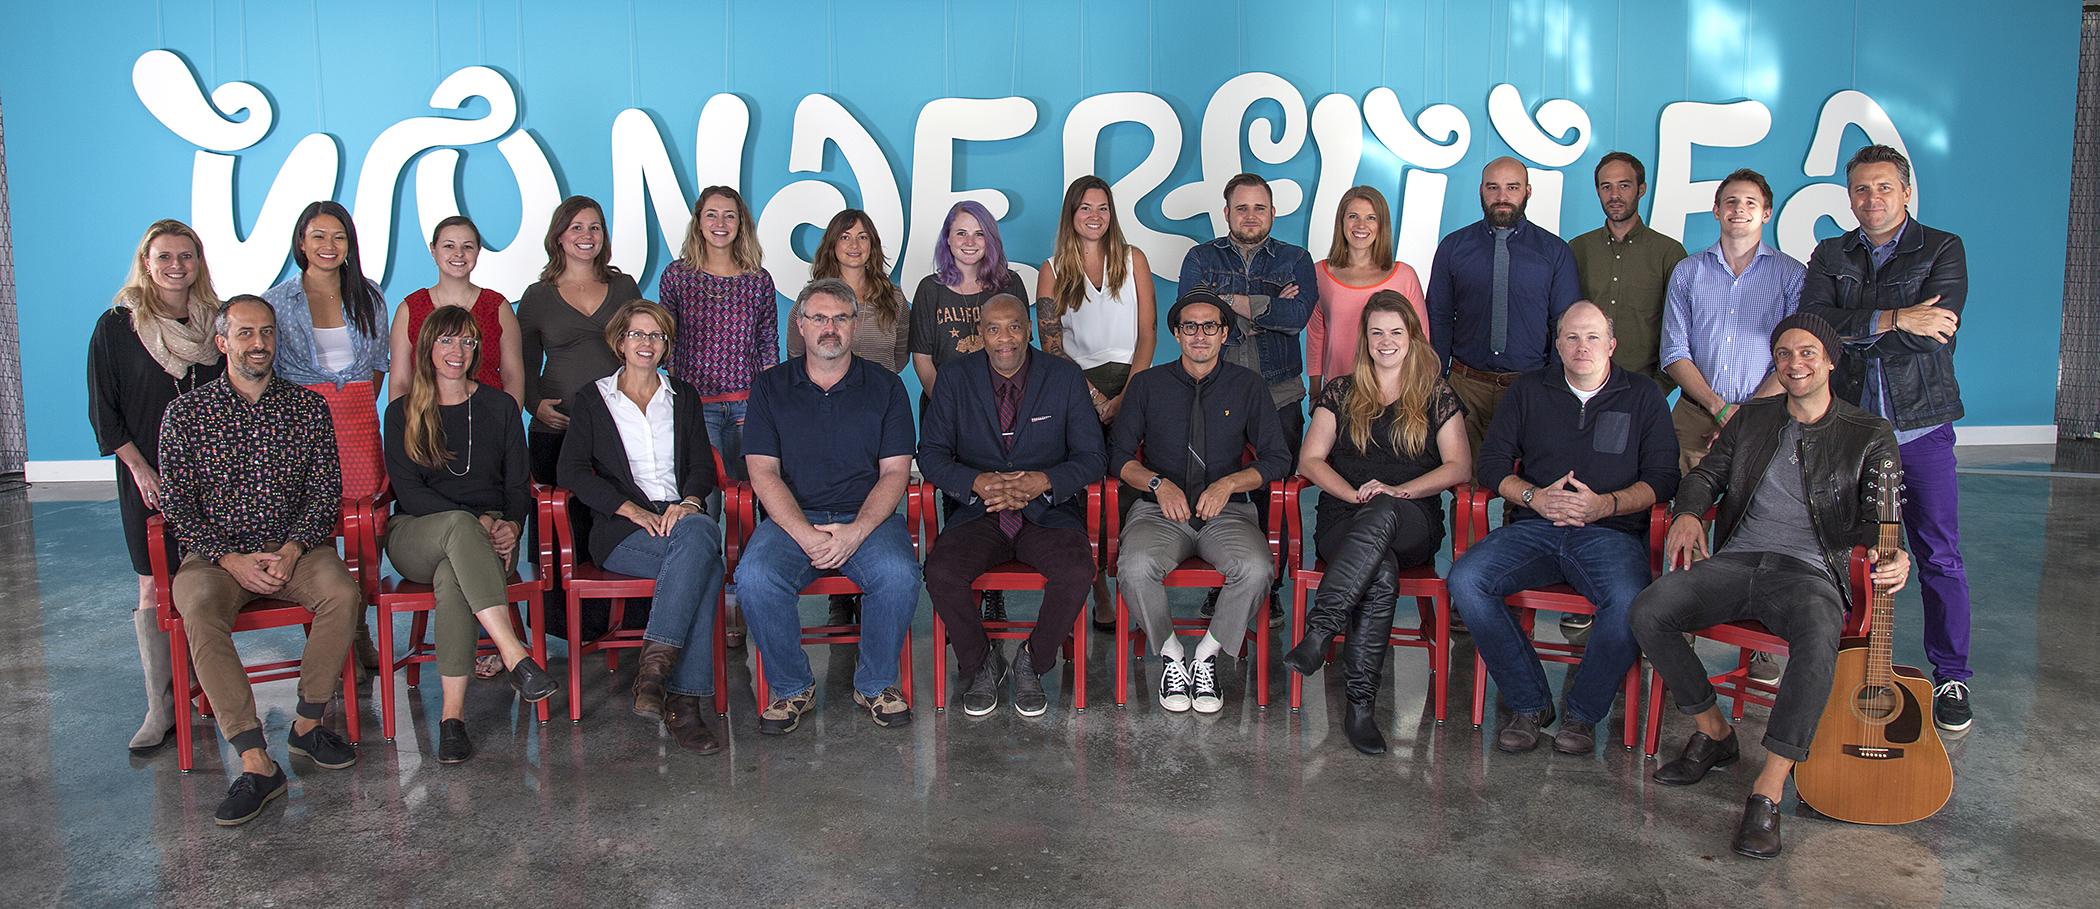 The Martin Agency Oreo Wonderfilled Team